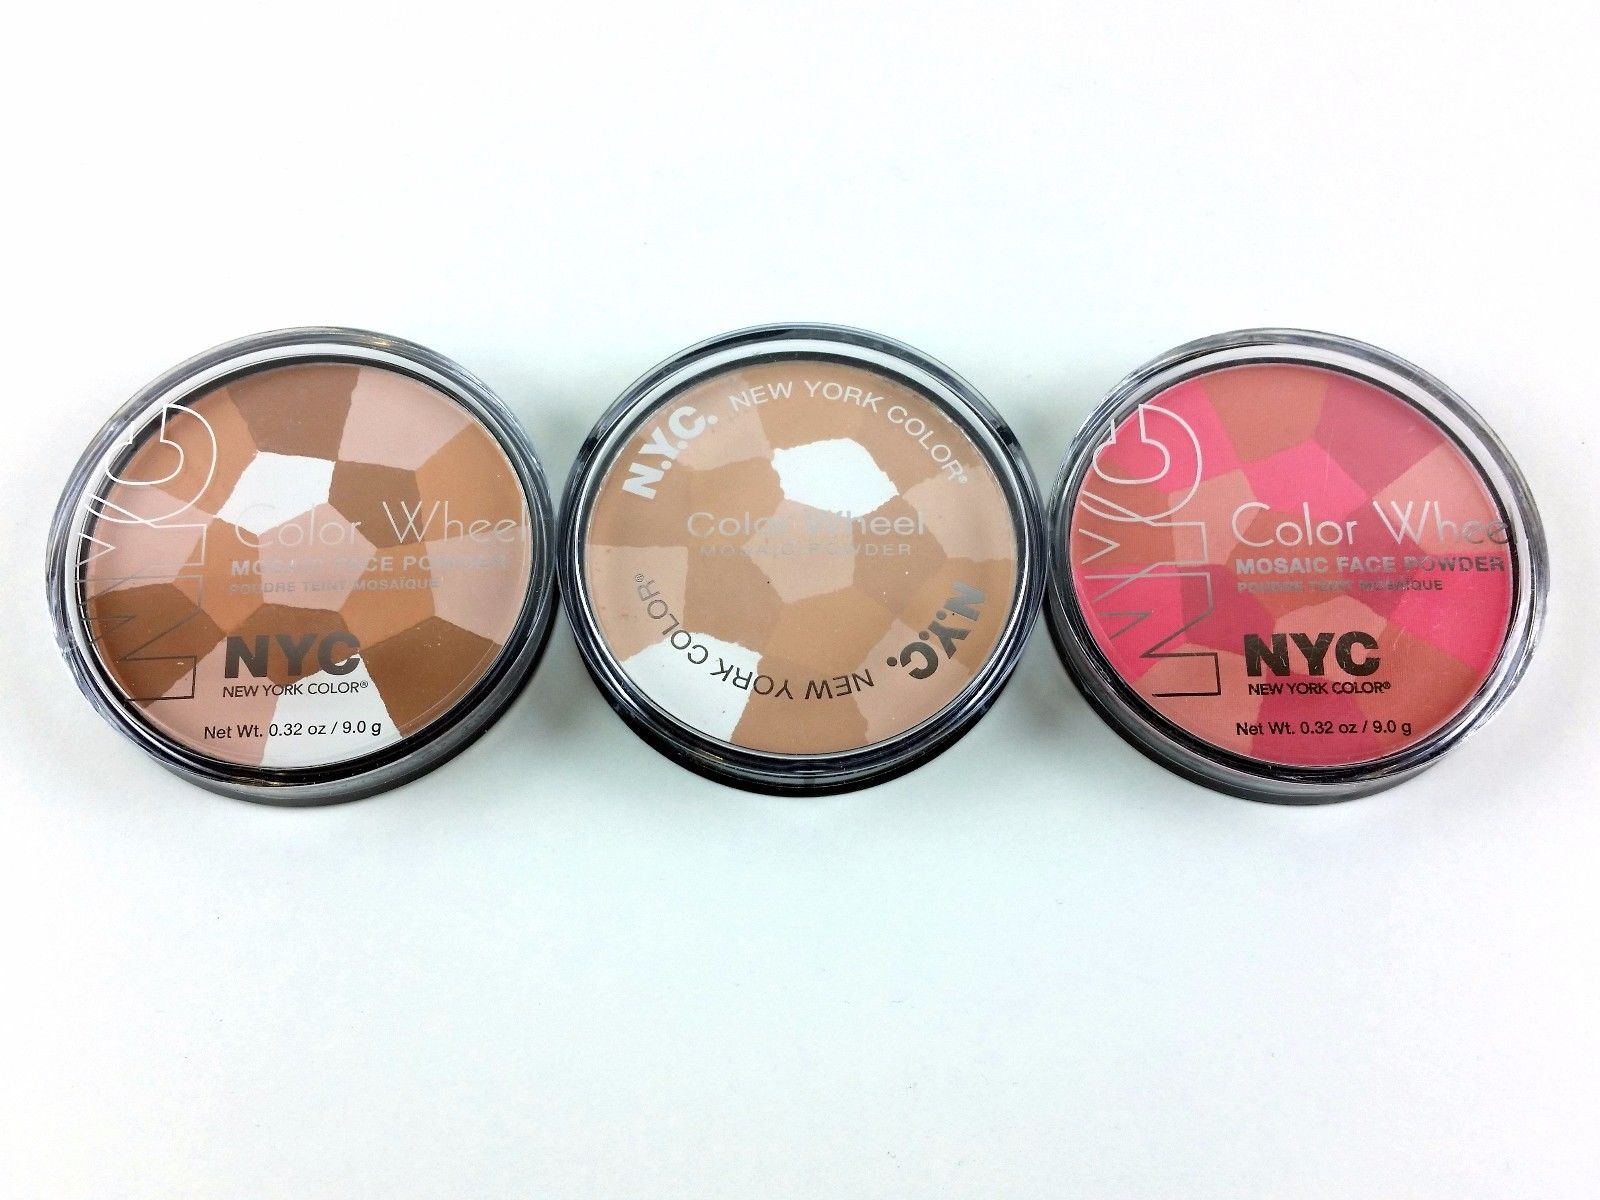 nyc color wheel mosaic powder 722a usa 722a canada